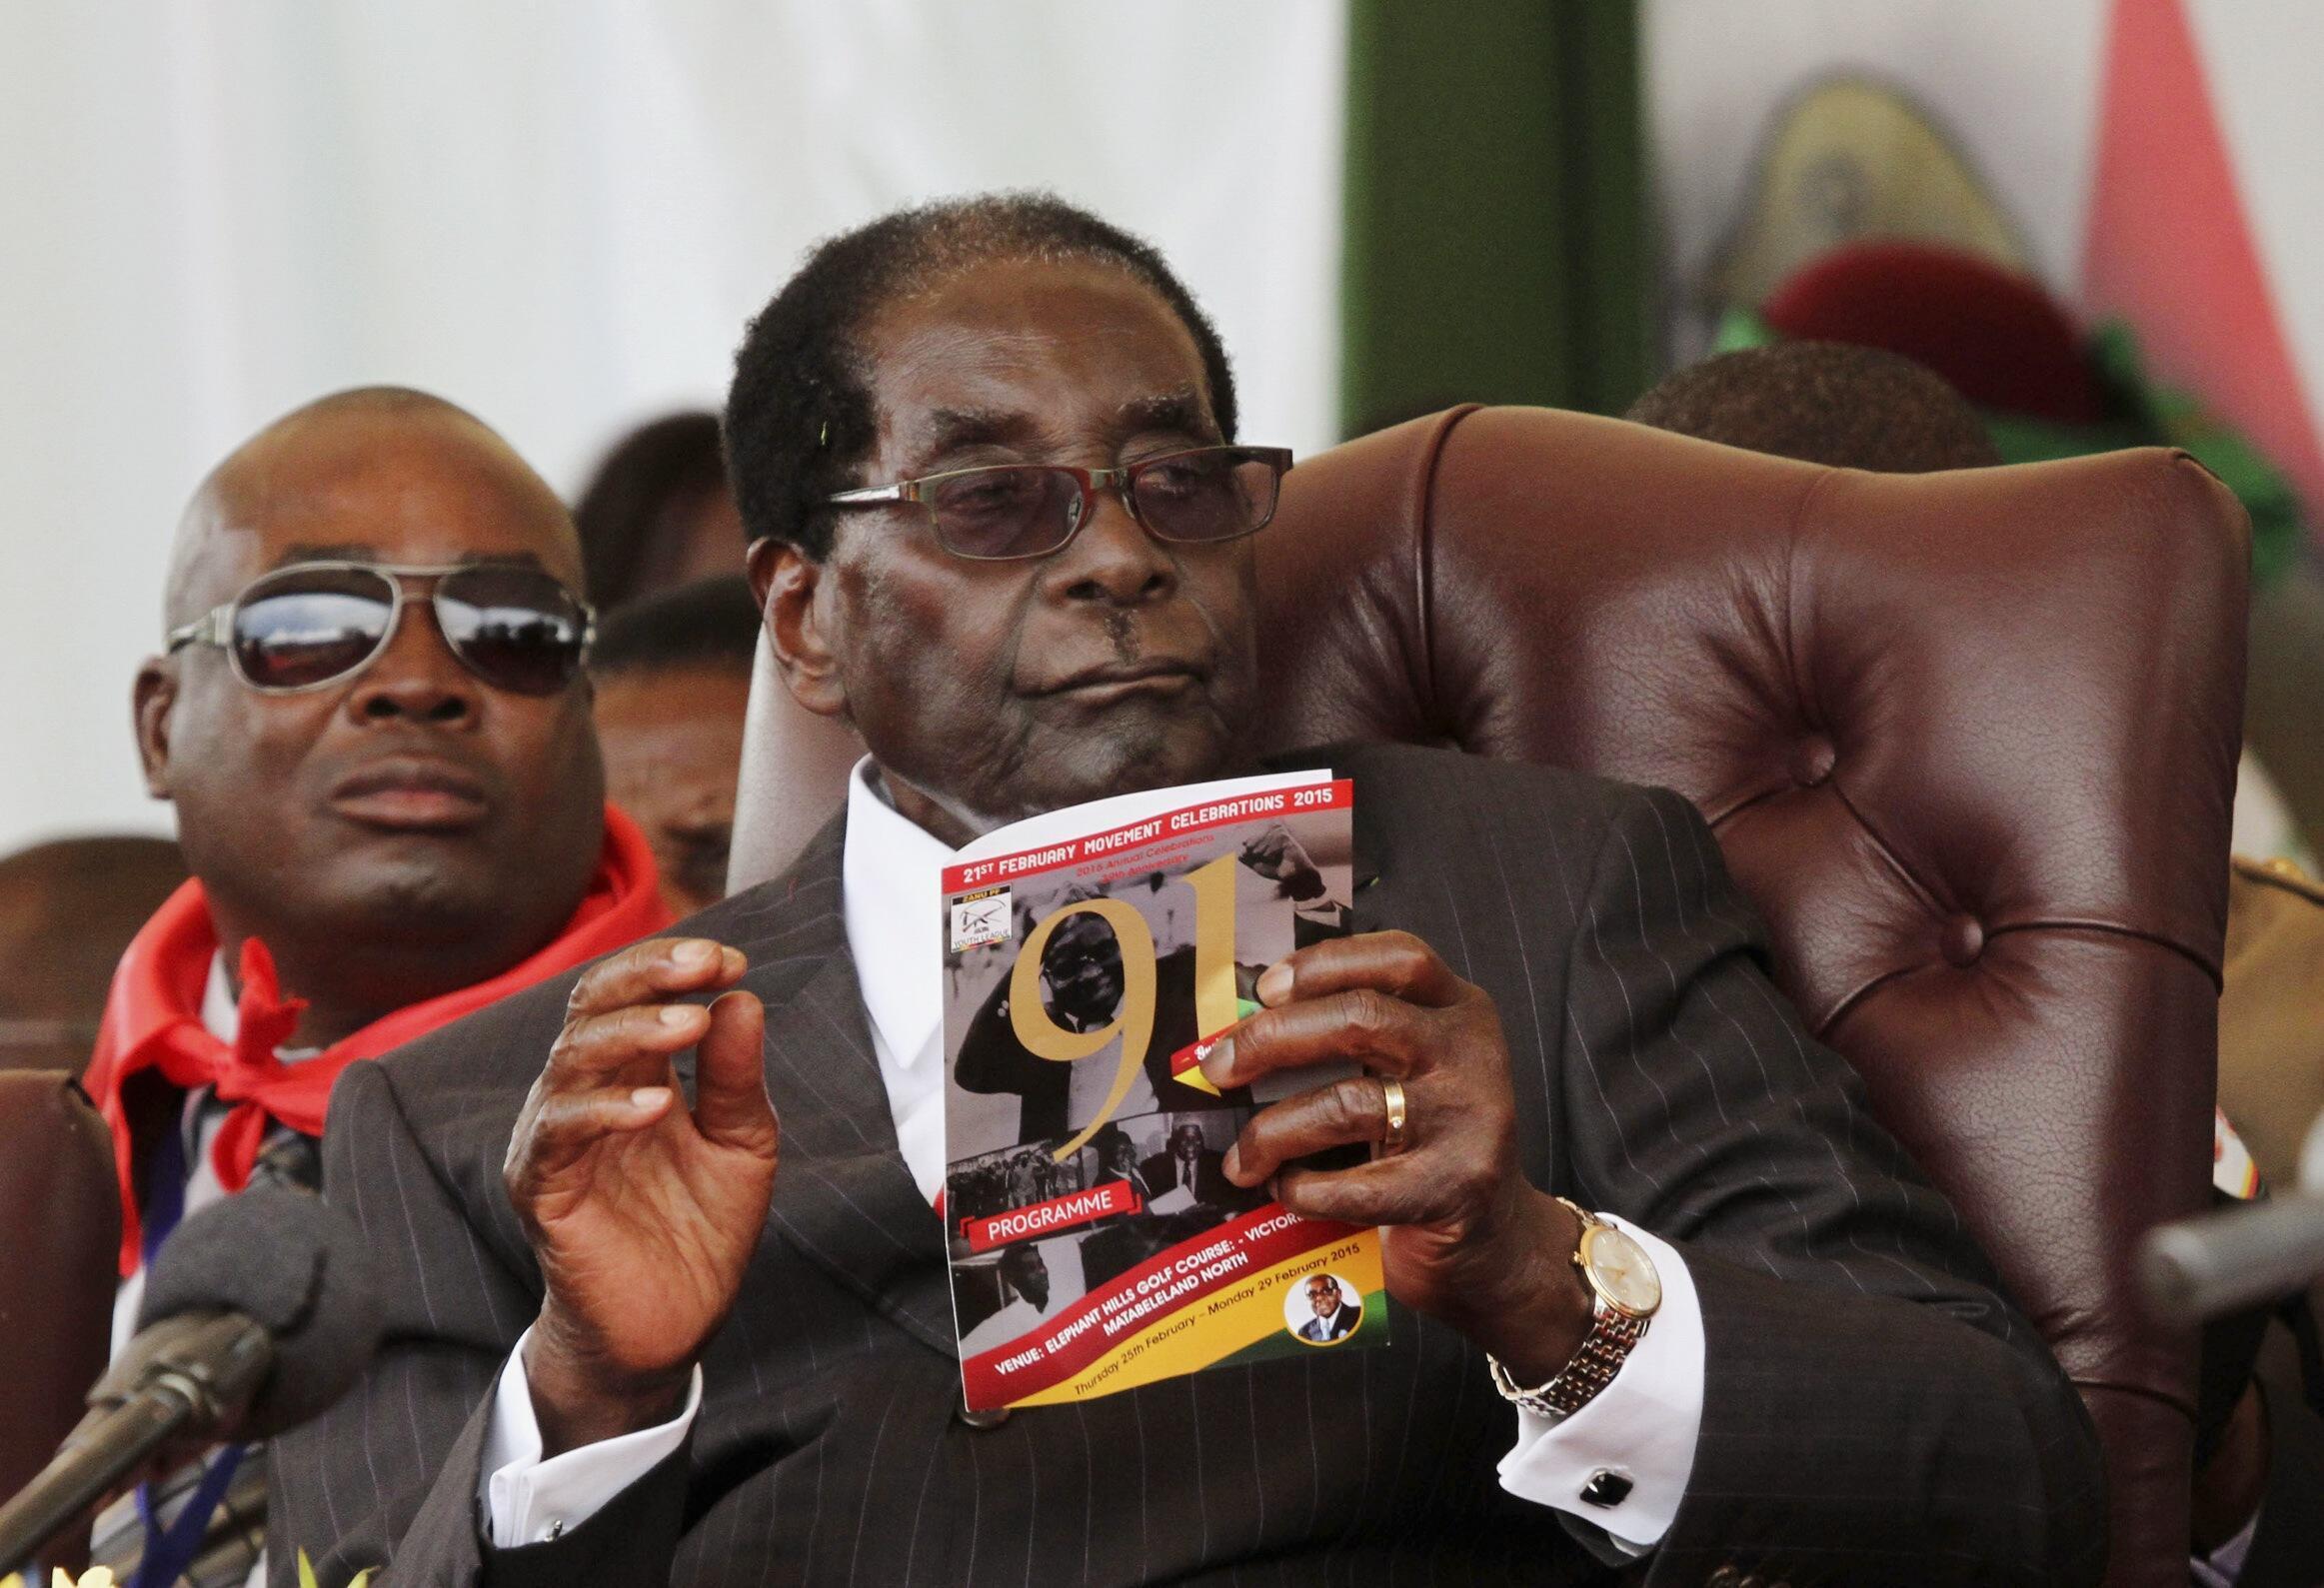 Robert Mugabe during his birthday party, February 2015